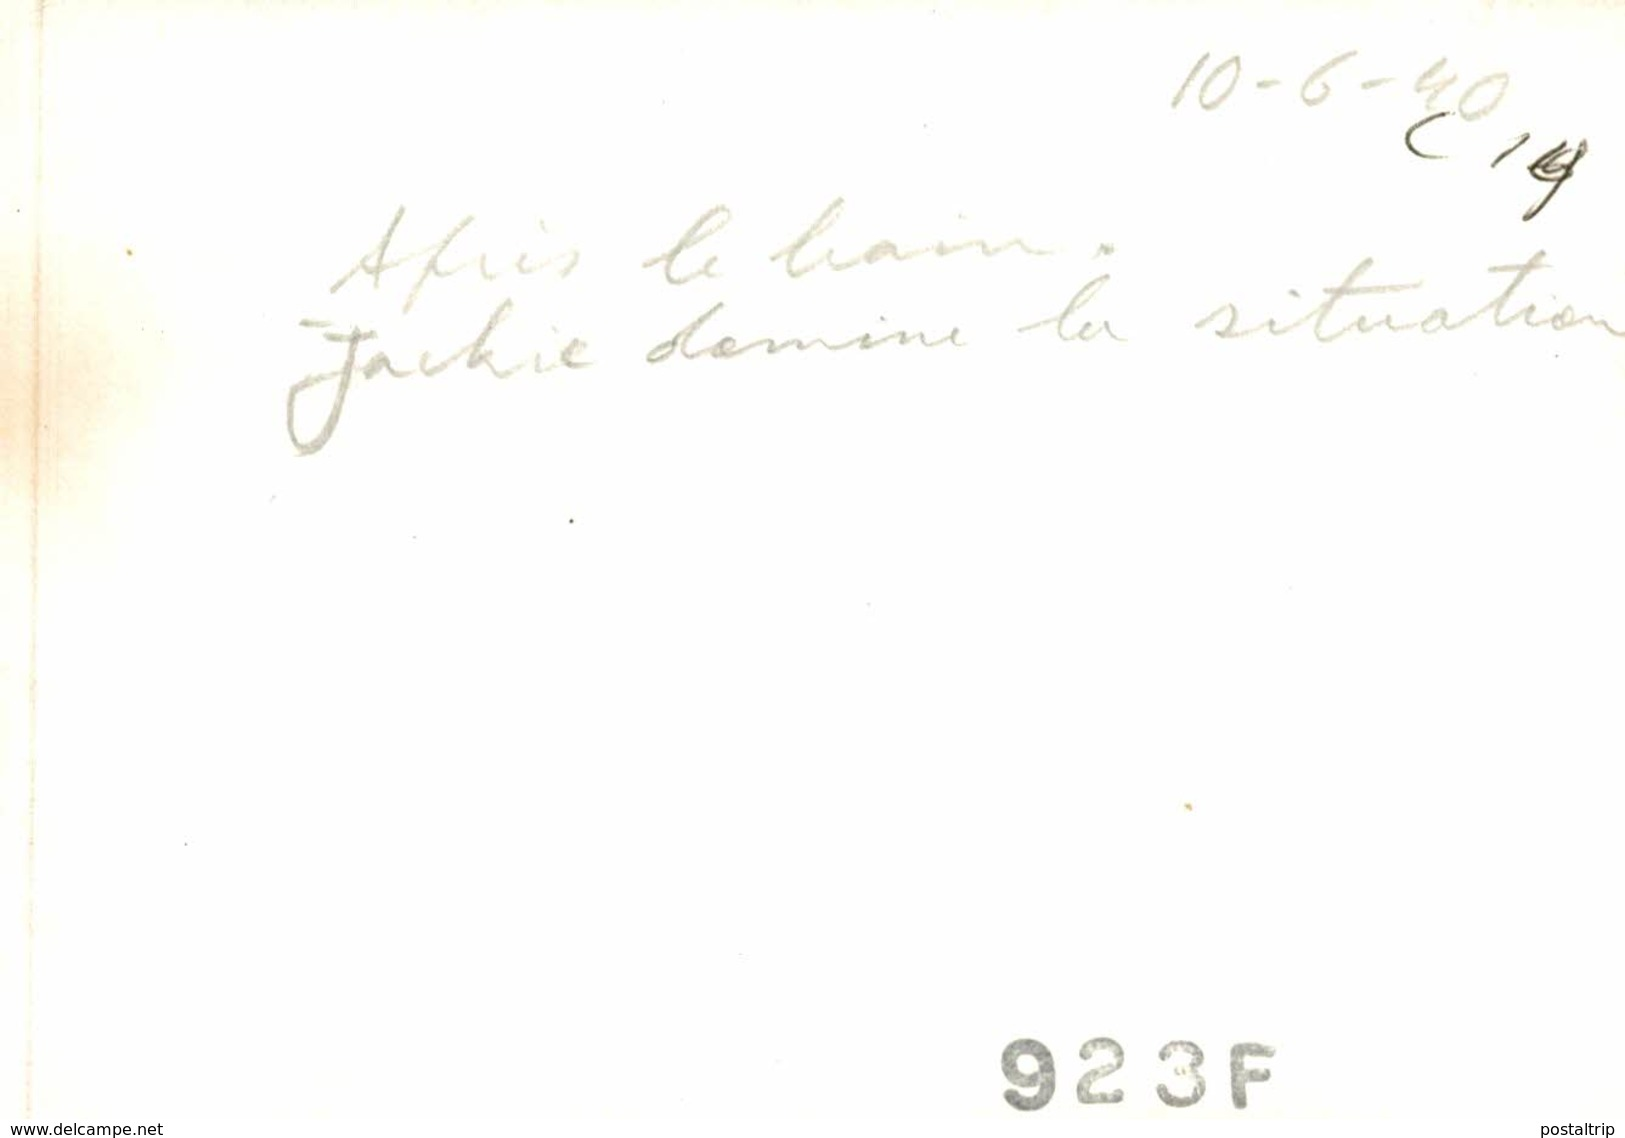 CREW OF THE MERCATOR    FOTOS PRIVADO VIAJE MERCATOR 1940 +- 11.5 * 8CM Voilier - Velero Sailboat - Barcos